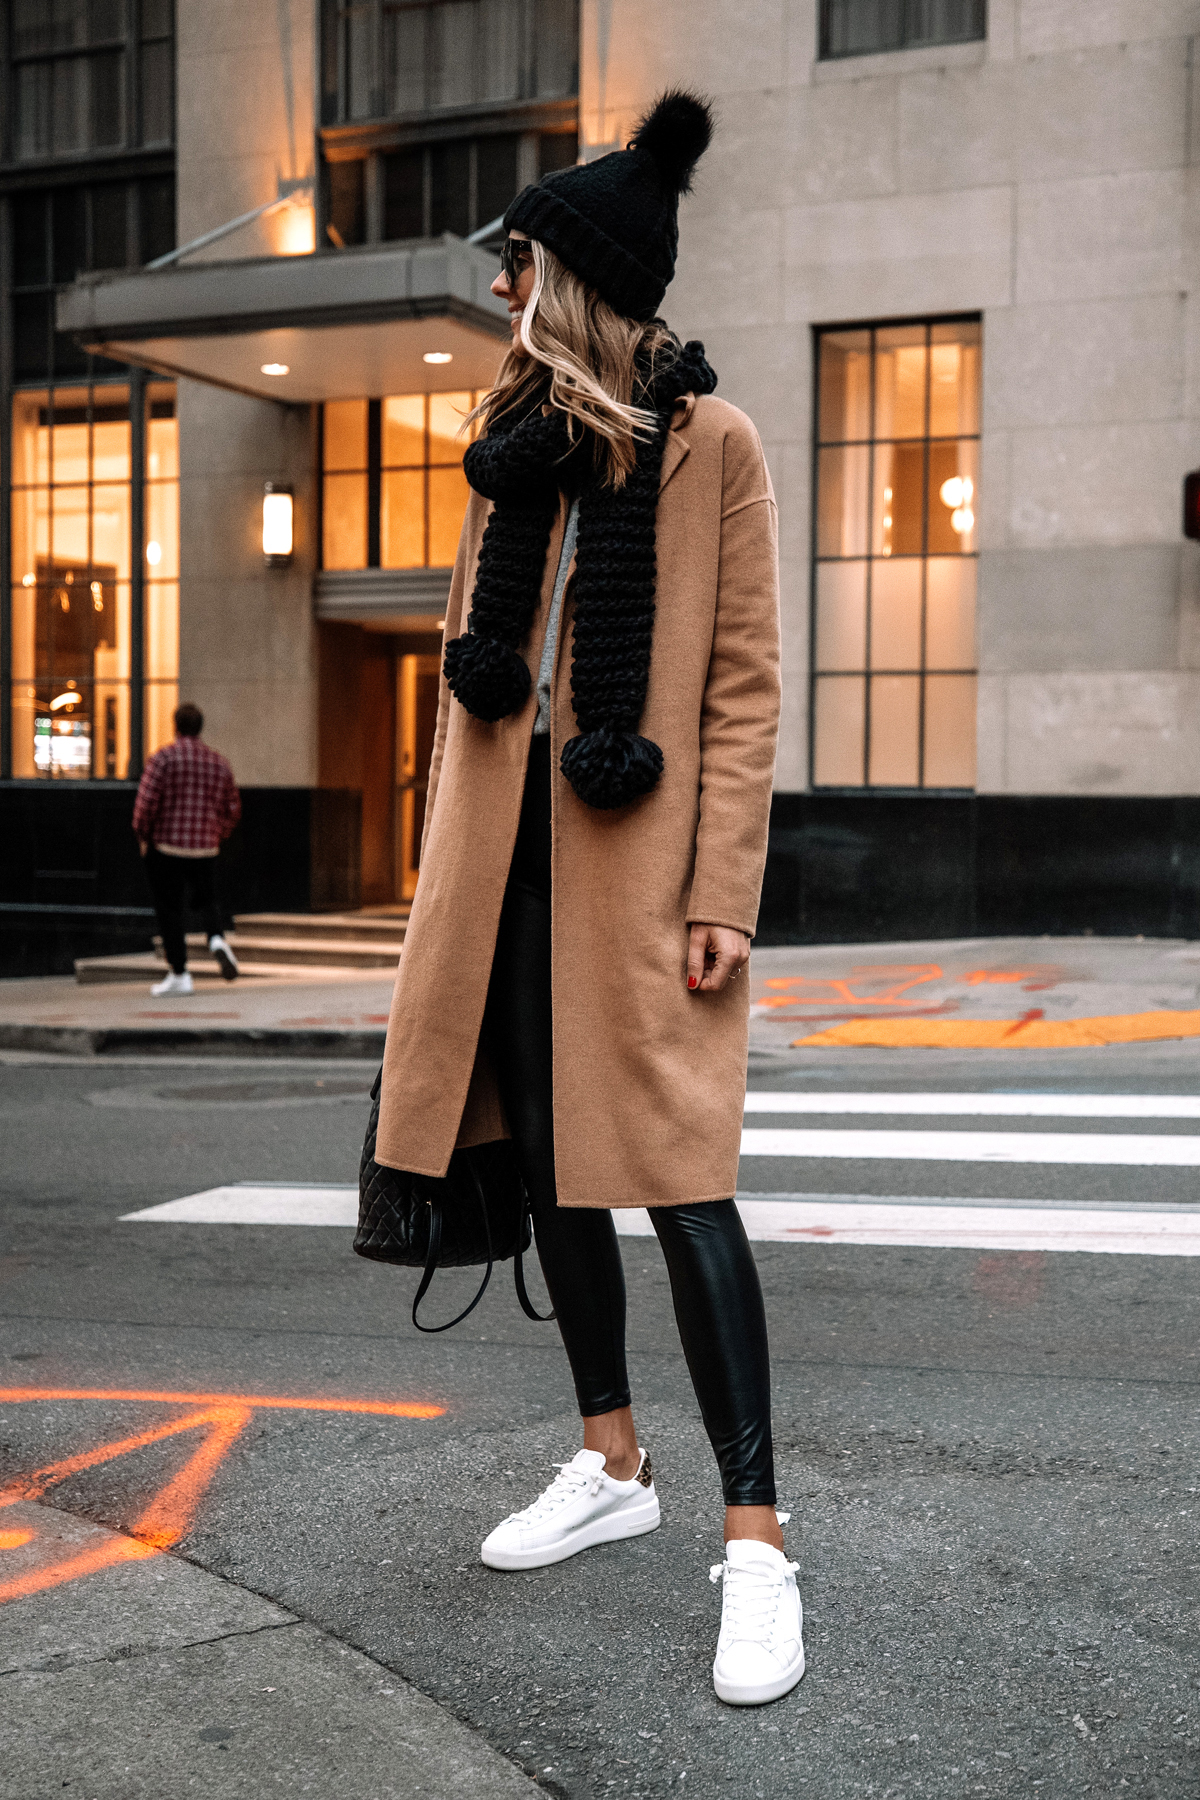 Fashion Jackson Wearing Express Camel Coat Faux Leather Leggings White Sneakers Black Scarf Black Beanie Street Style